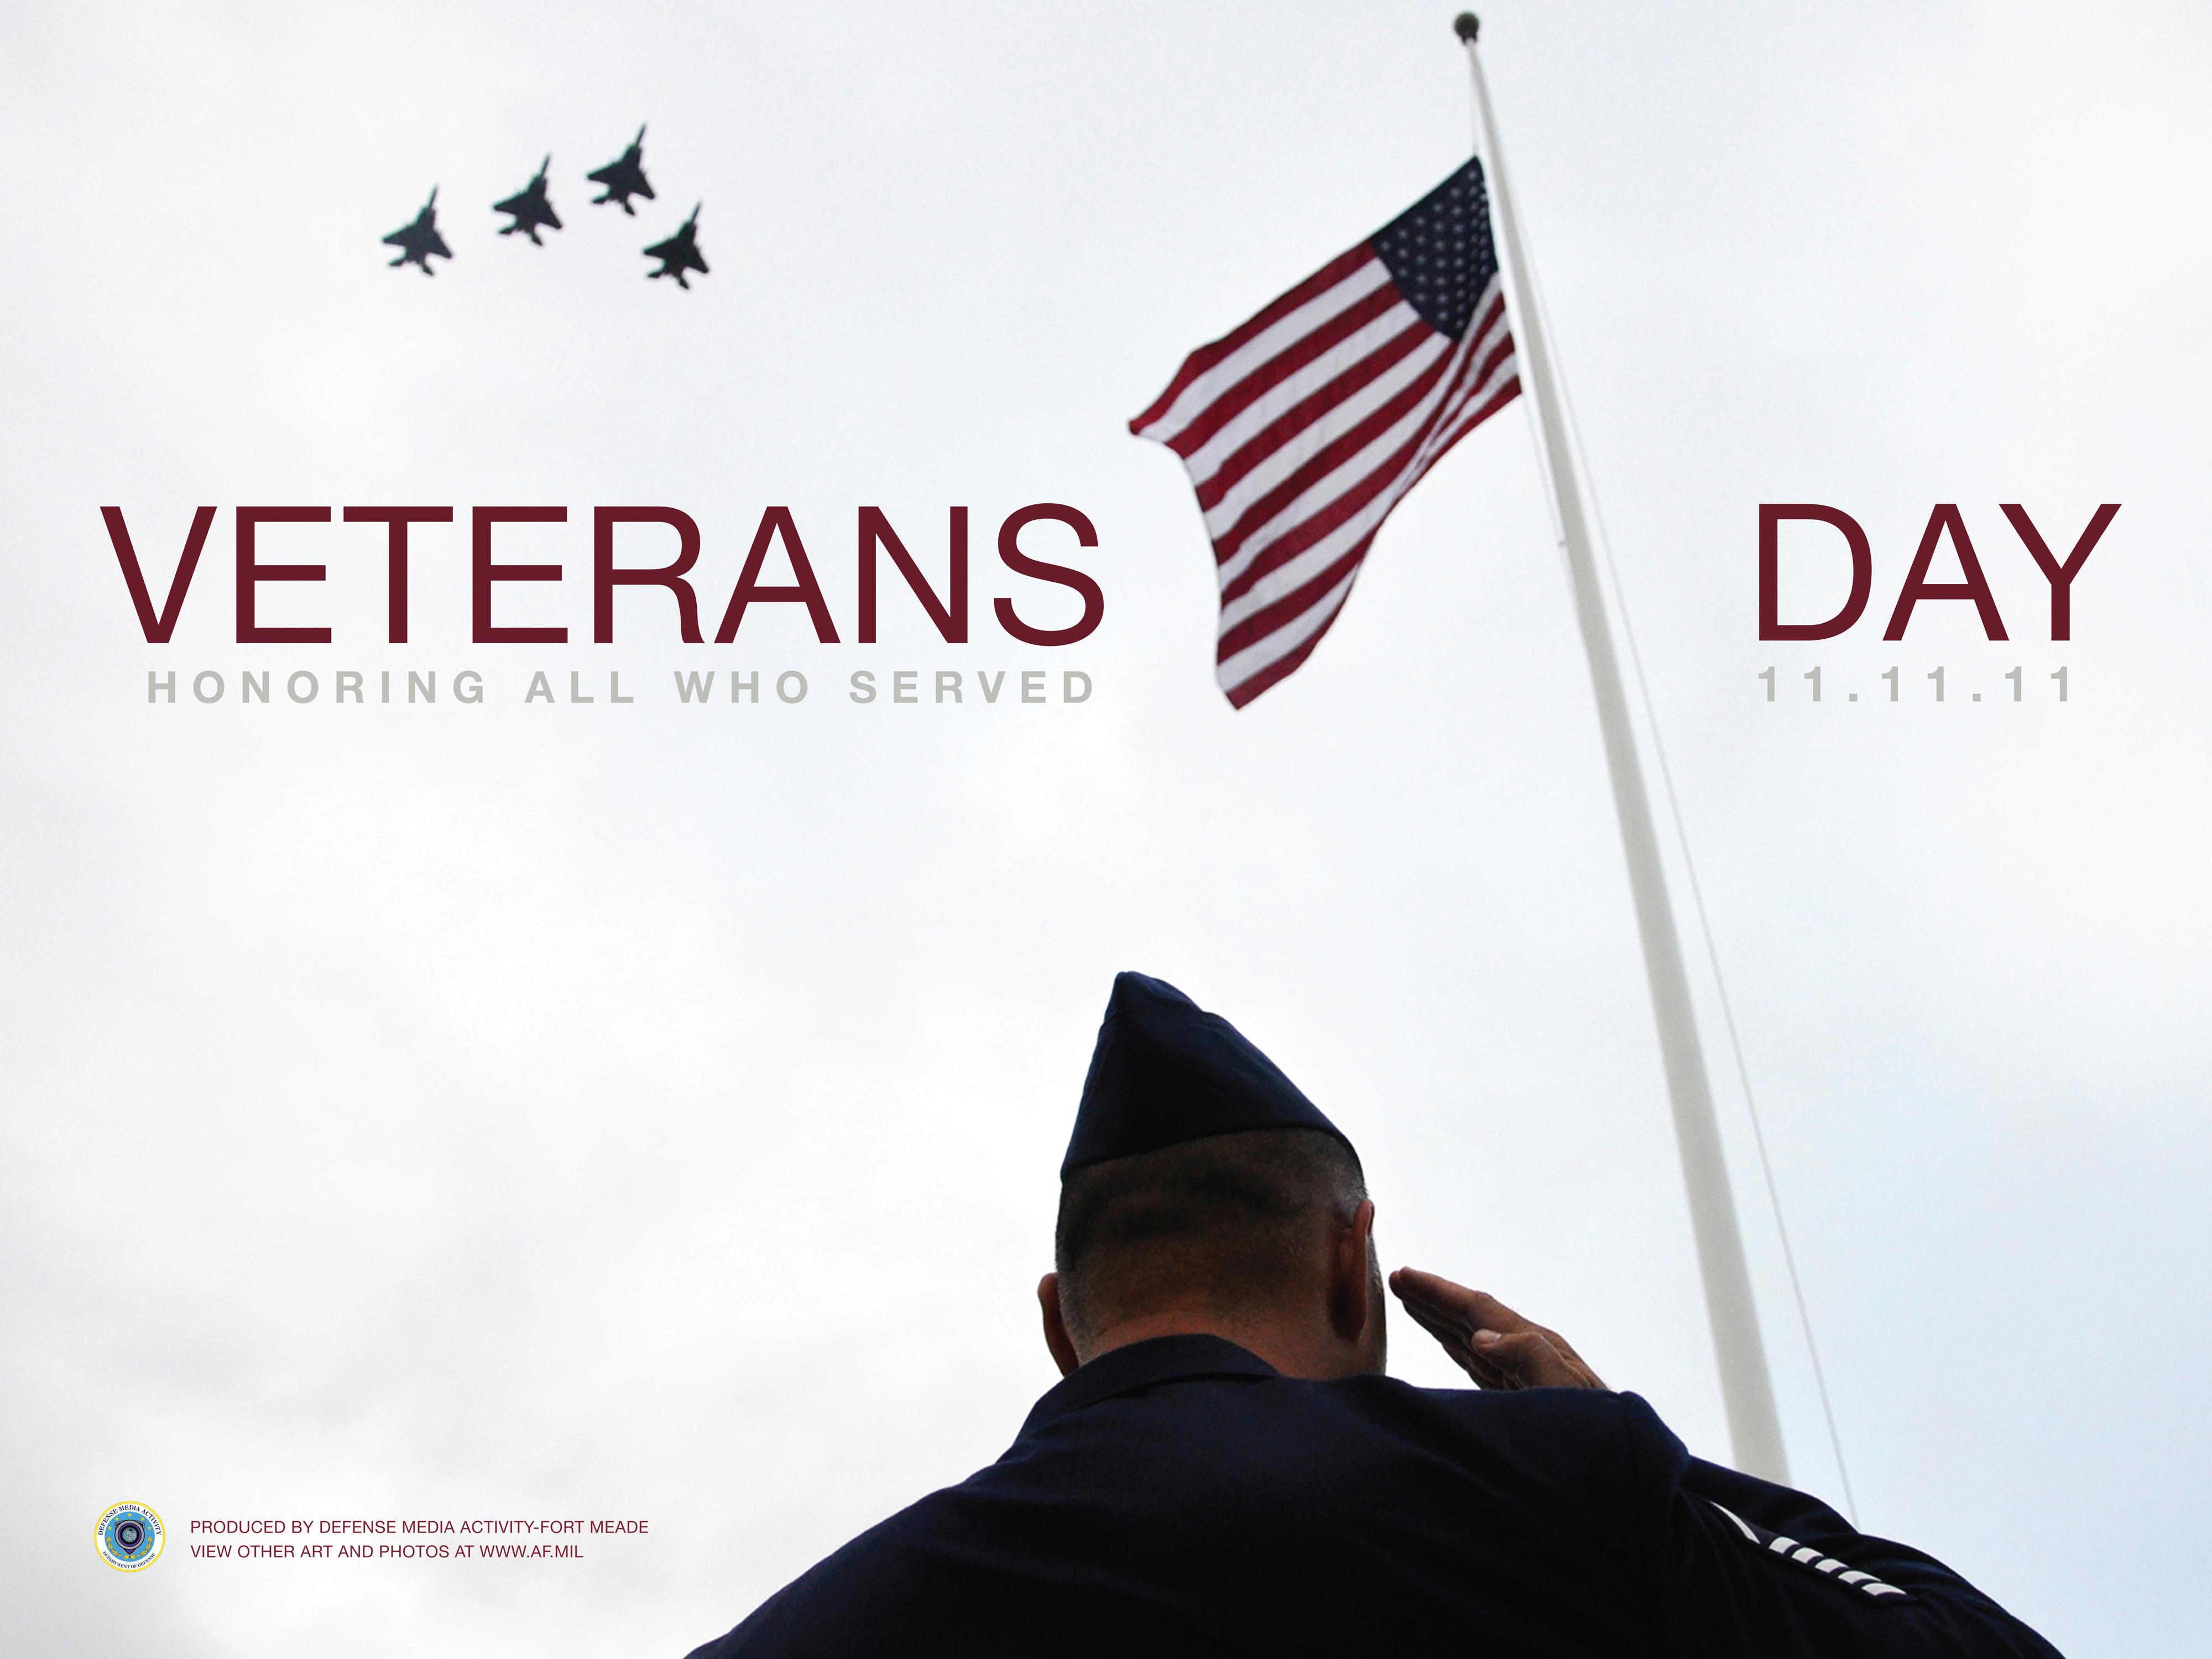 Veterans day essay question